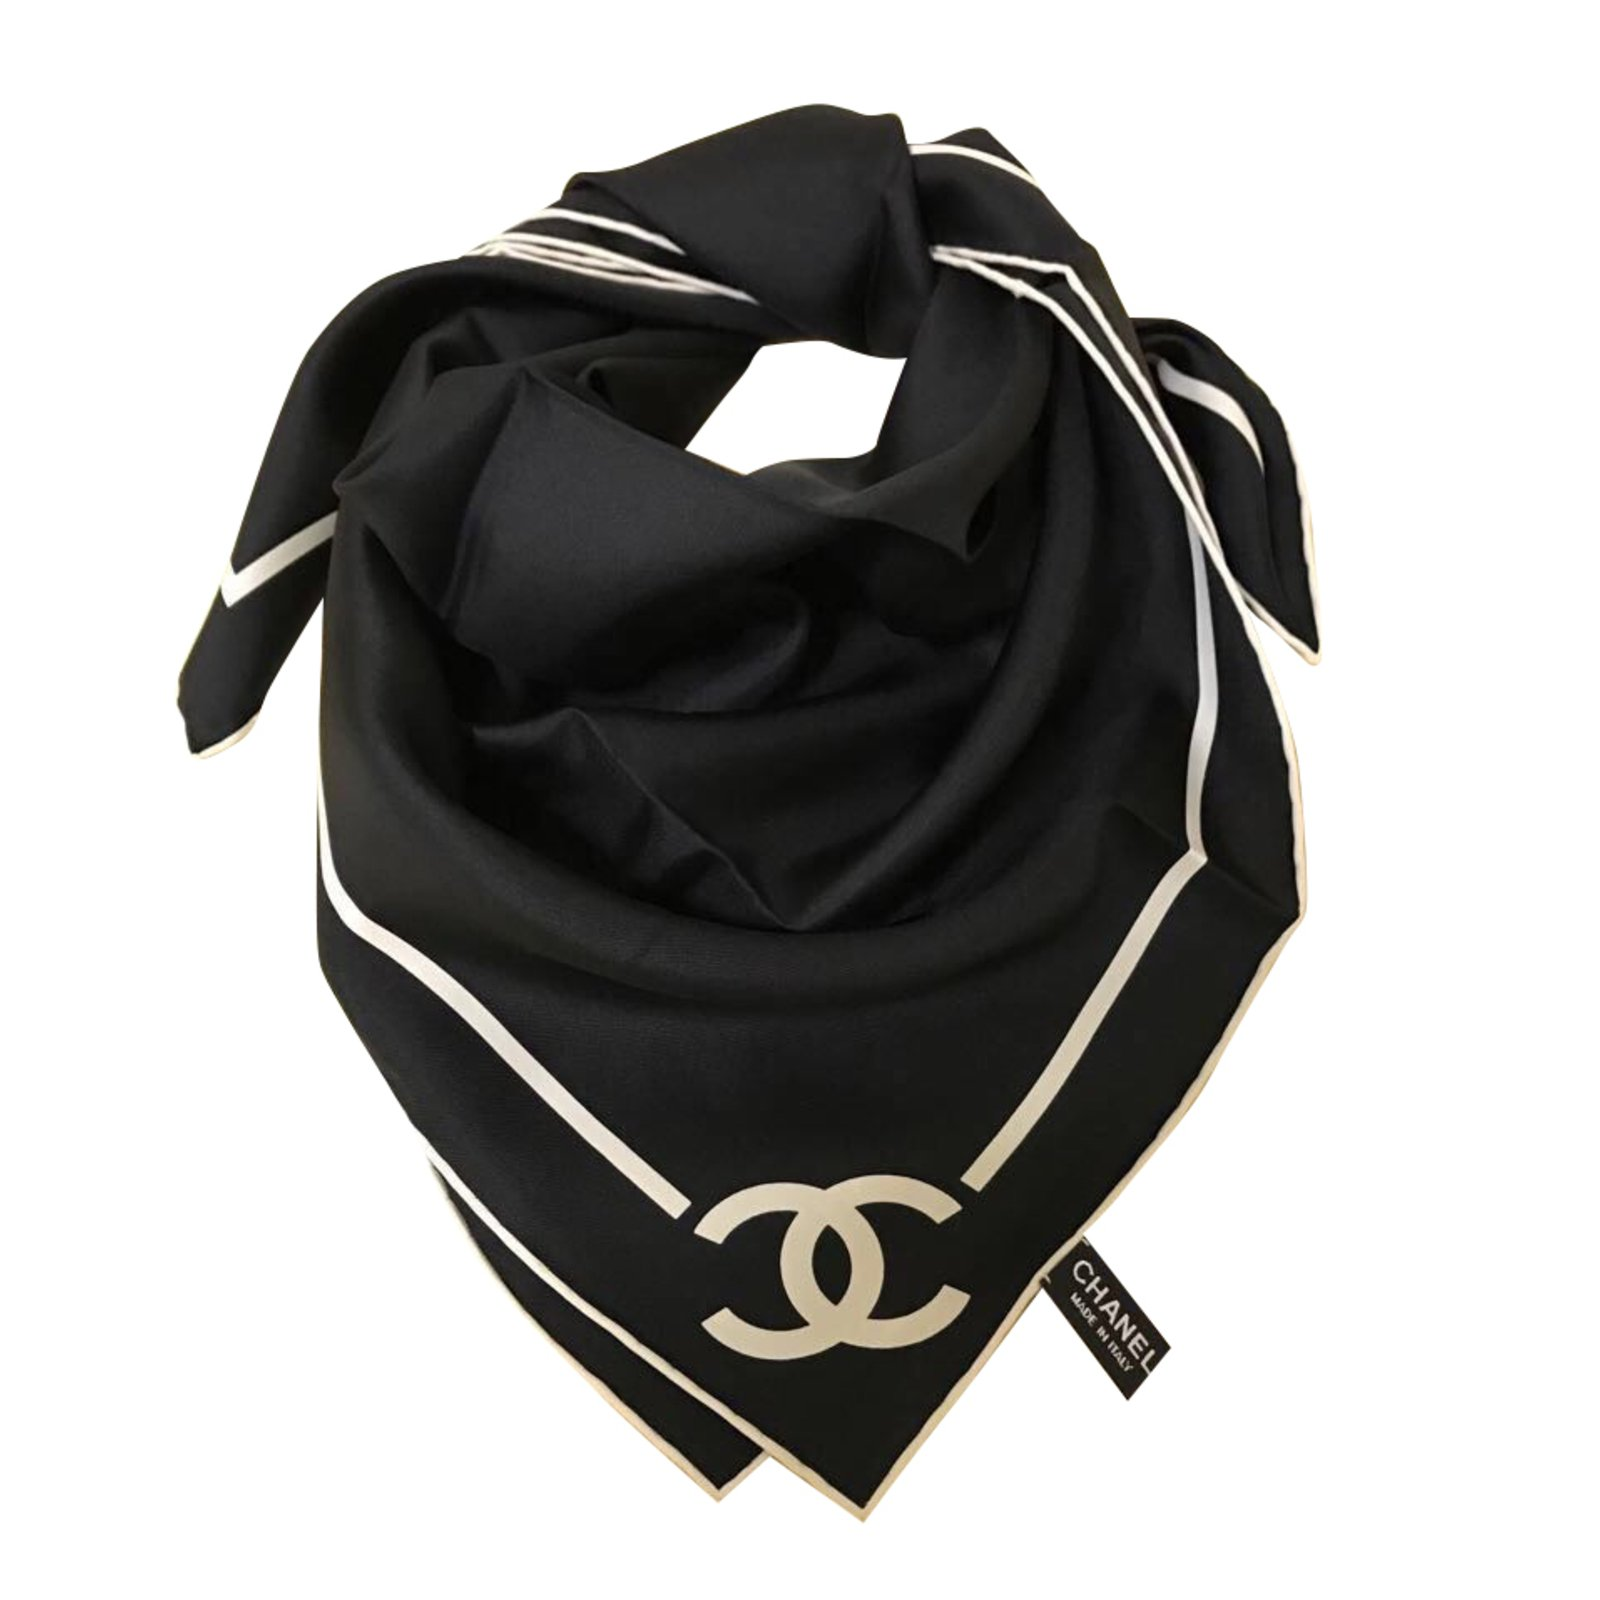 Foulards Chanel FOULARD SOIE CHANEL Soie Noir ref.41515 - Joli Closet 5f184c659db